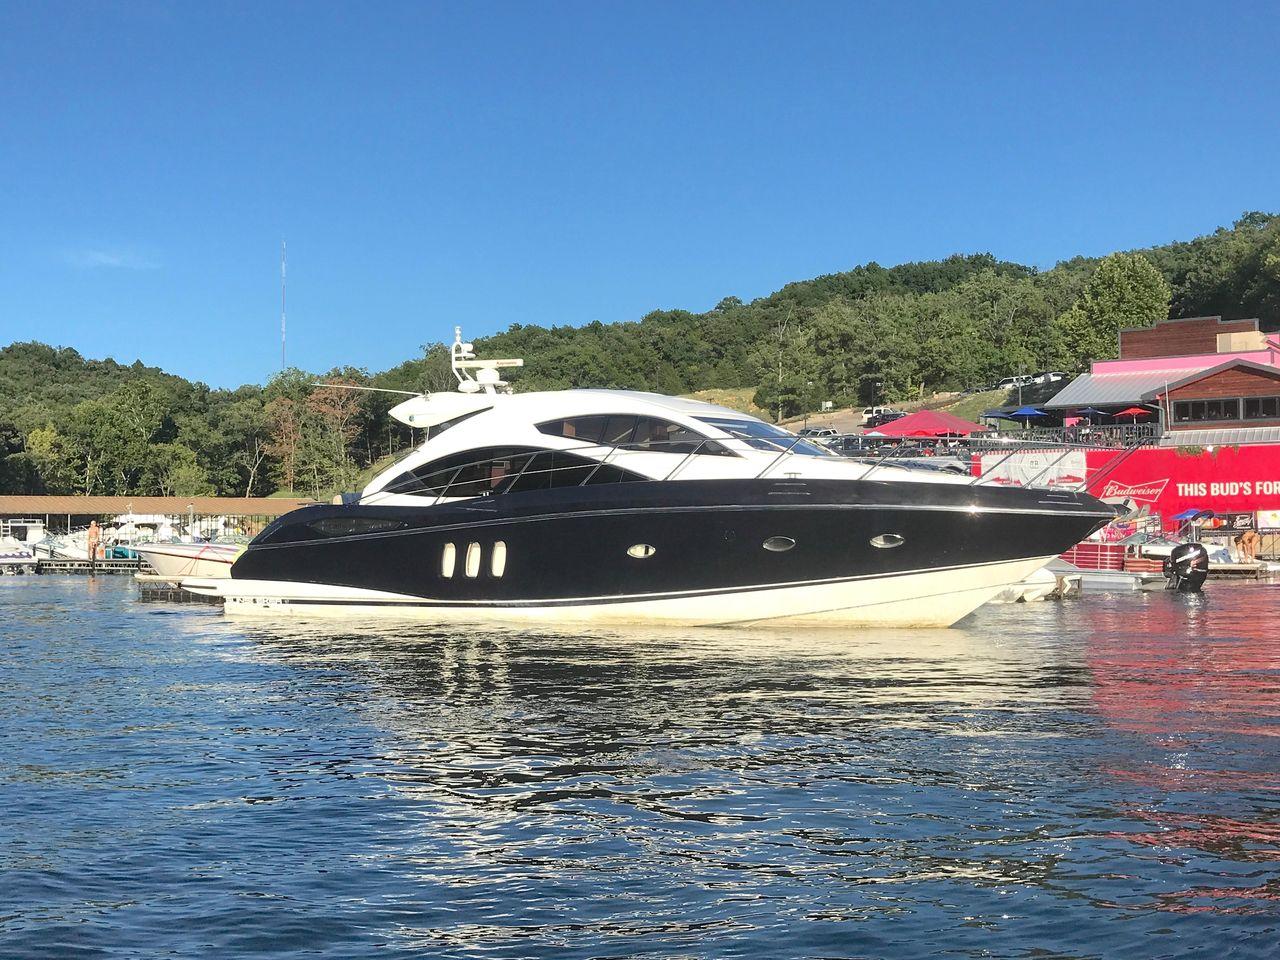 2010 Used Sunseeker Predator 52predator 52 Motor Yacht For Sale